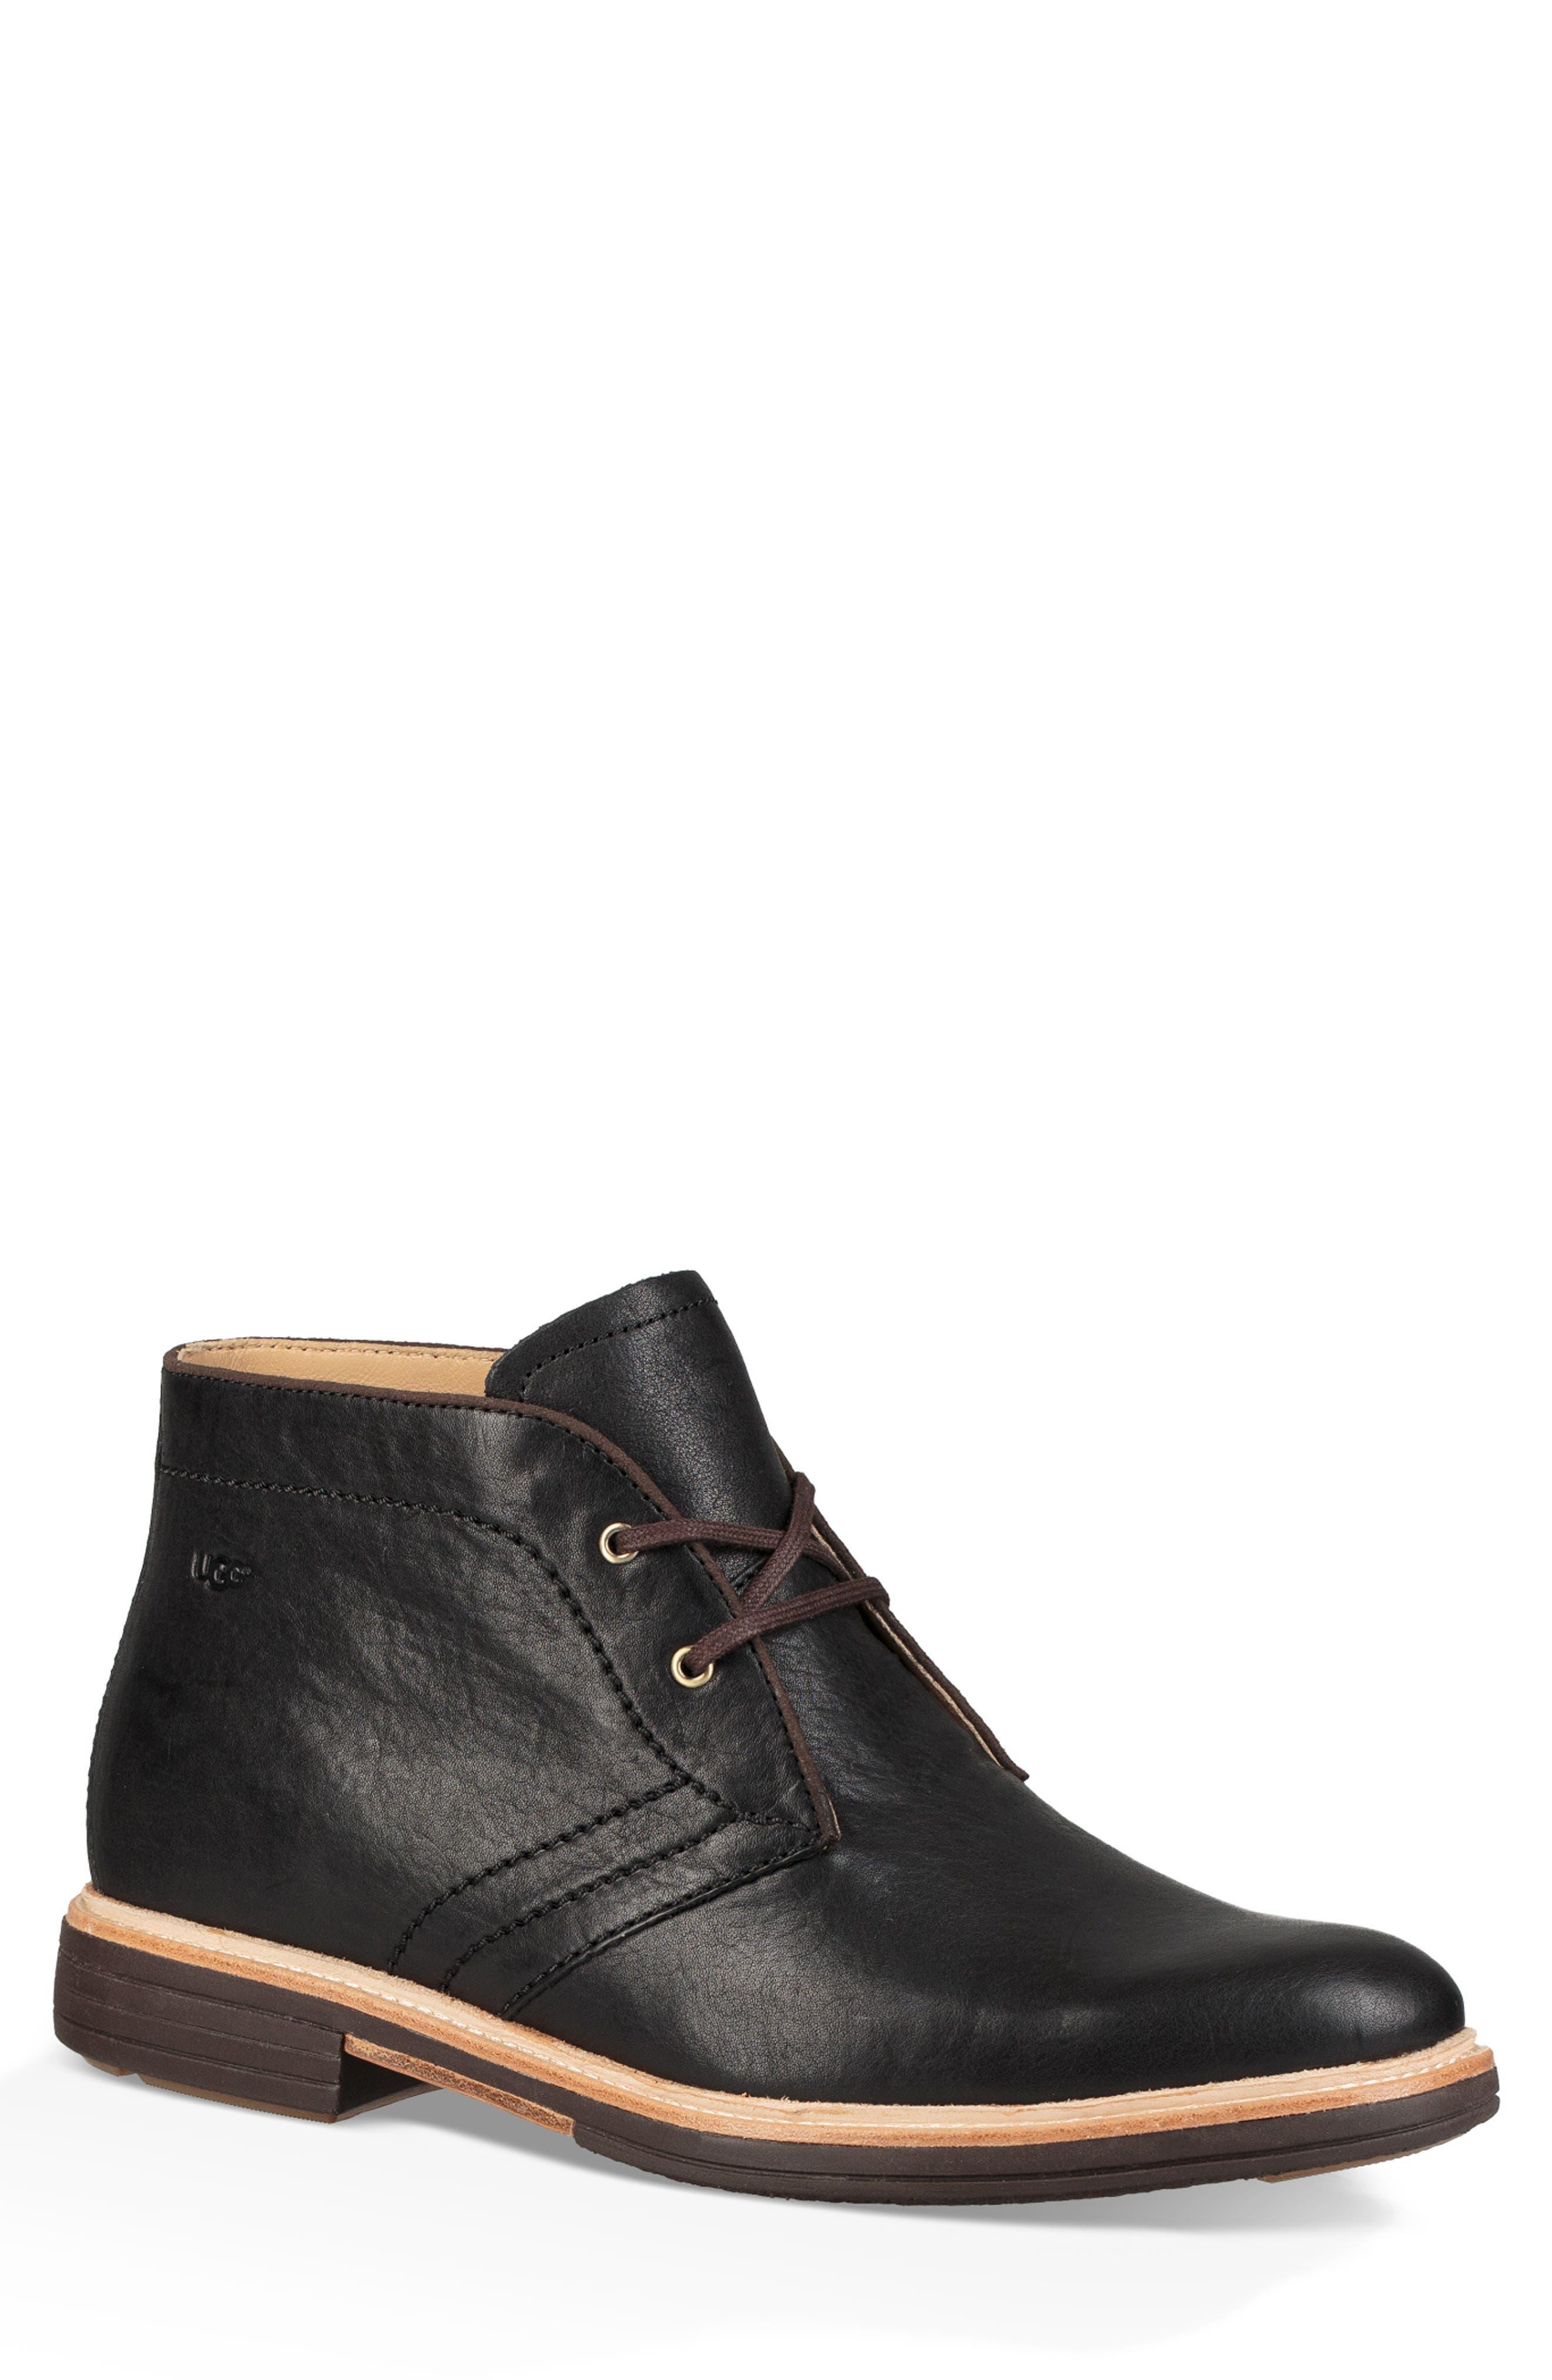 Australia Dagmann Chukka Boot,                         Main,                         color, BLACK LEATHER/SUEDE